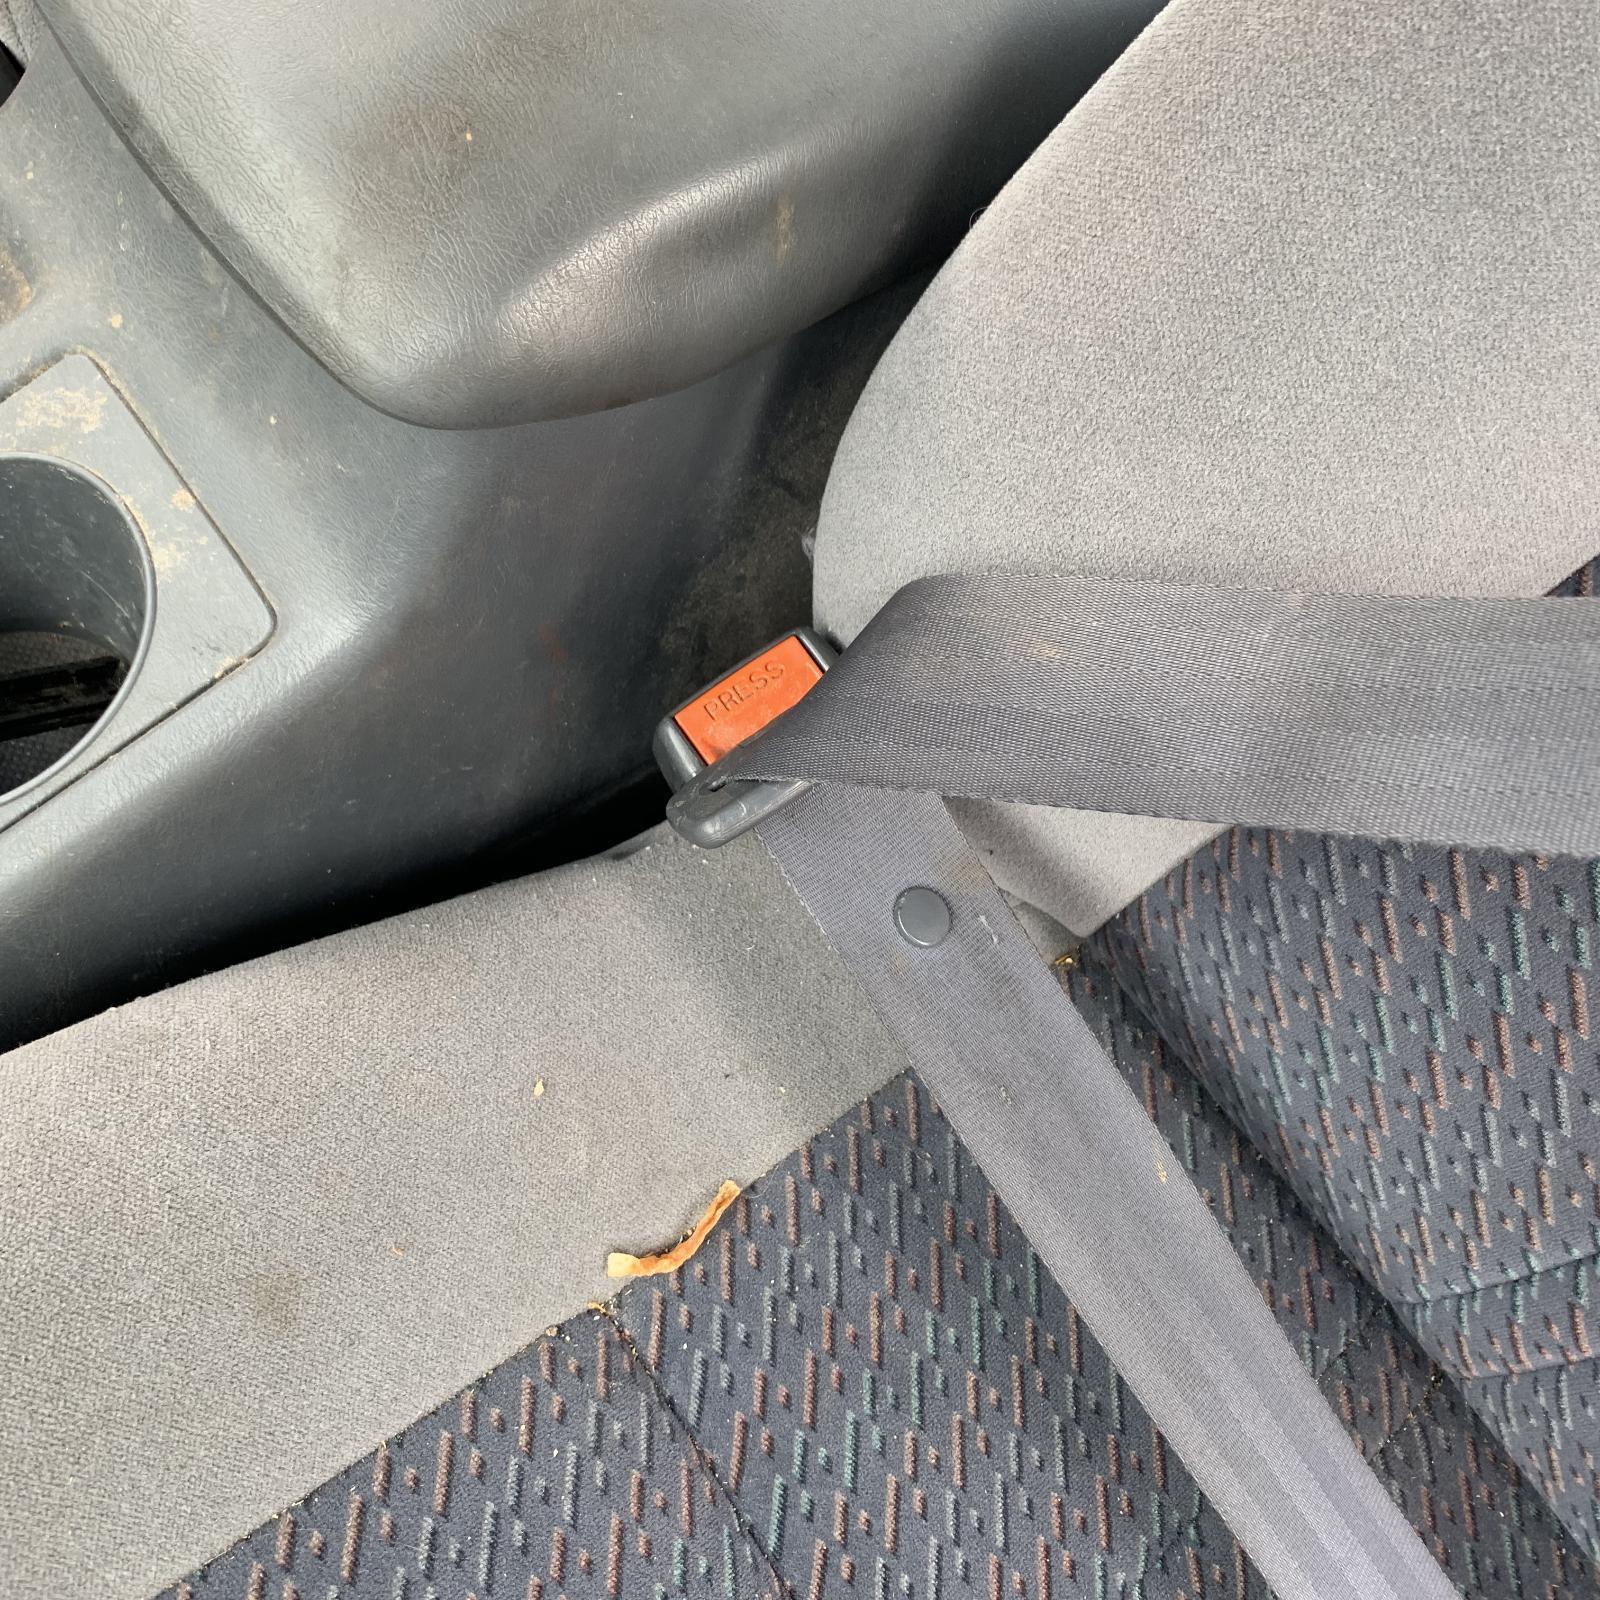 TOYOTA CAMRY, Seatbelt/Stalk, LH FRONT, SEAT BELT STALK ONLY, SK20, SEDAN/WAGON, 08/97-08/02